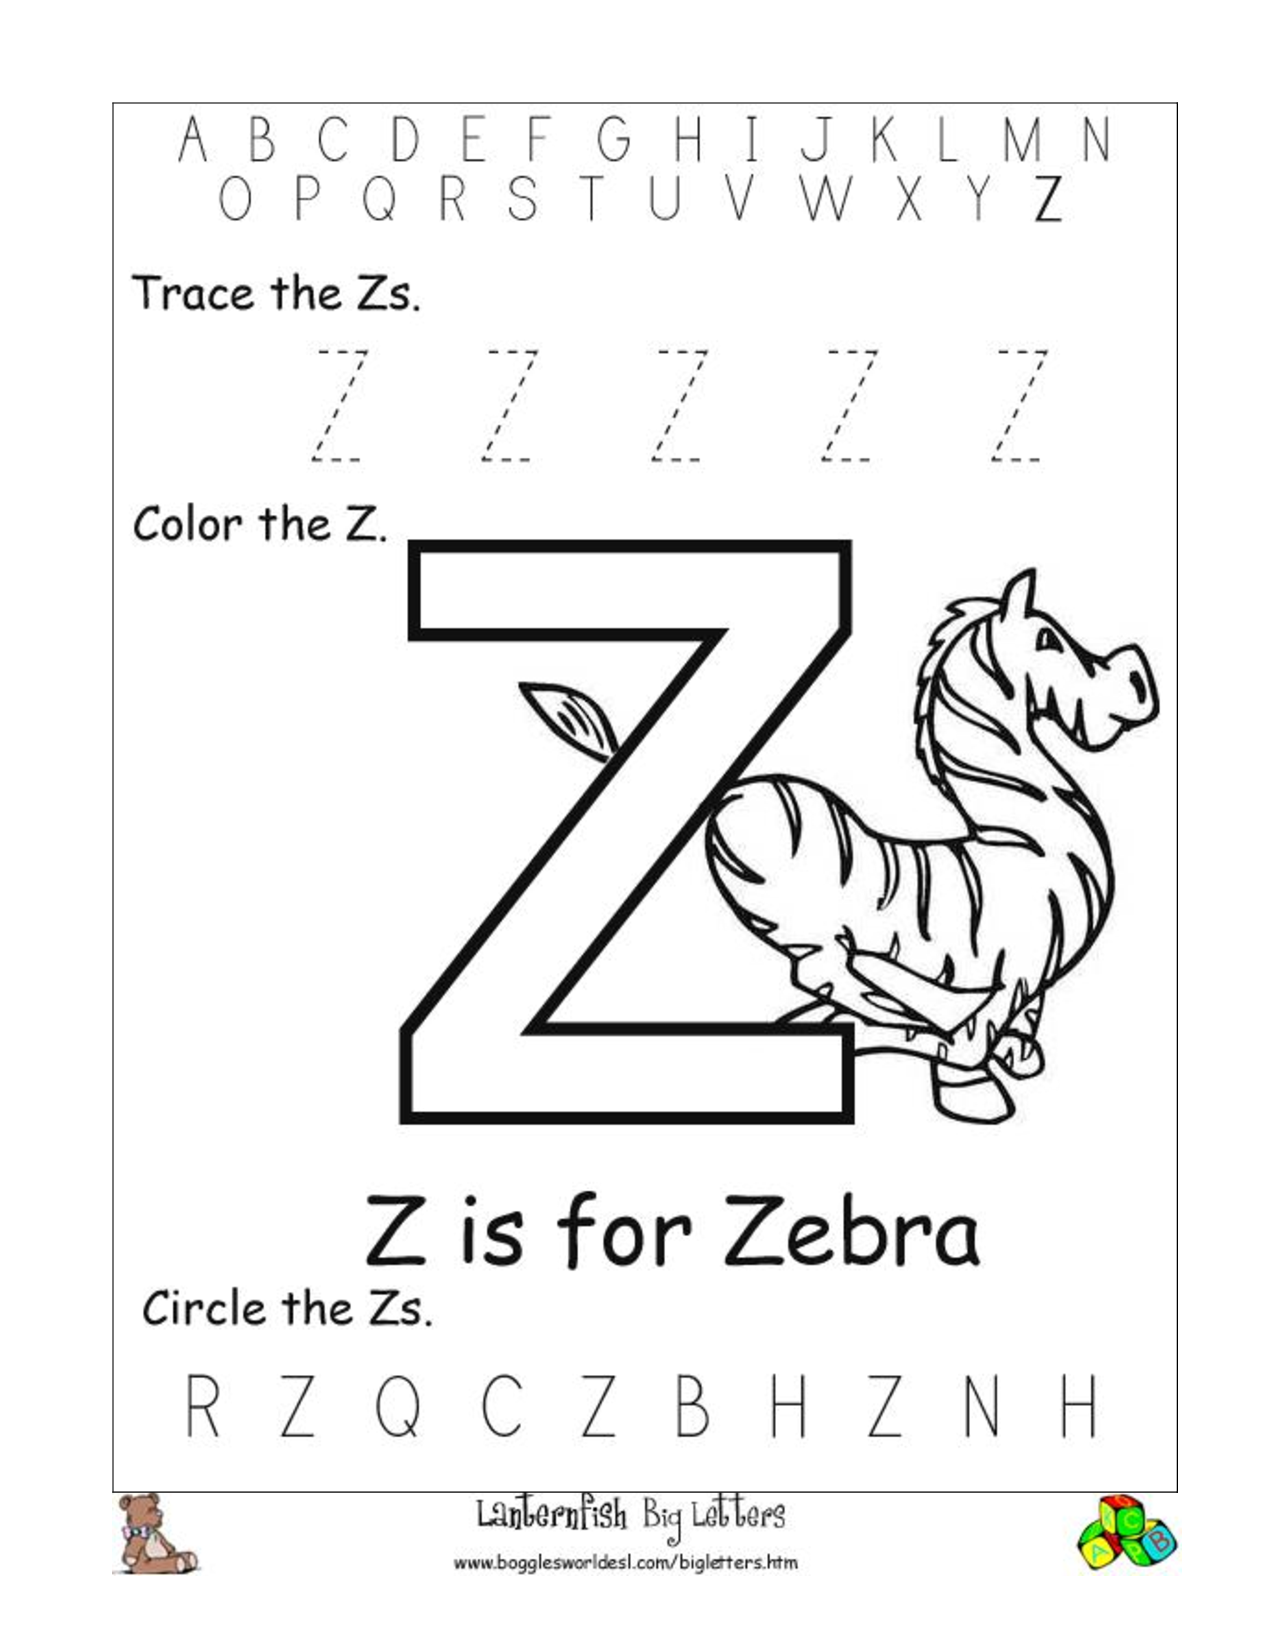 Alphabet Worksheets for Preschoolers Alphabet Worksheet